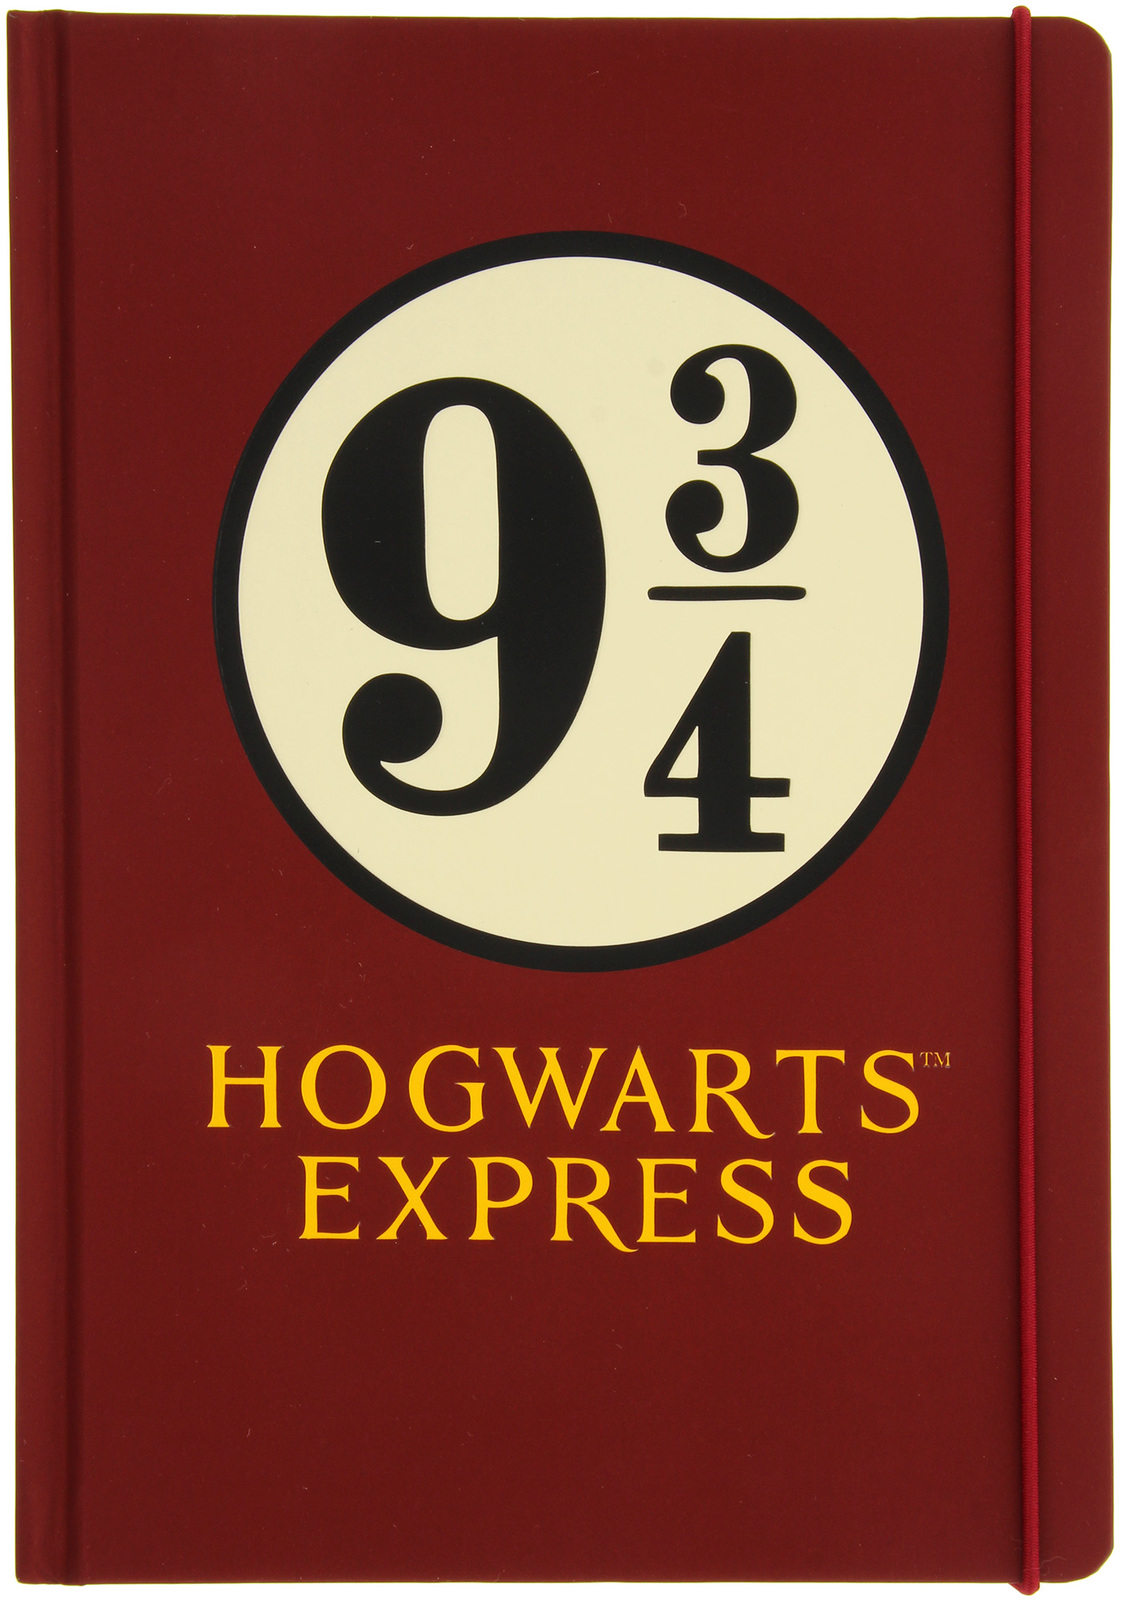 Harry Potter: Platform 9 3/4 - A5 Notebook image